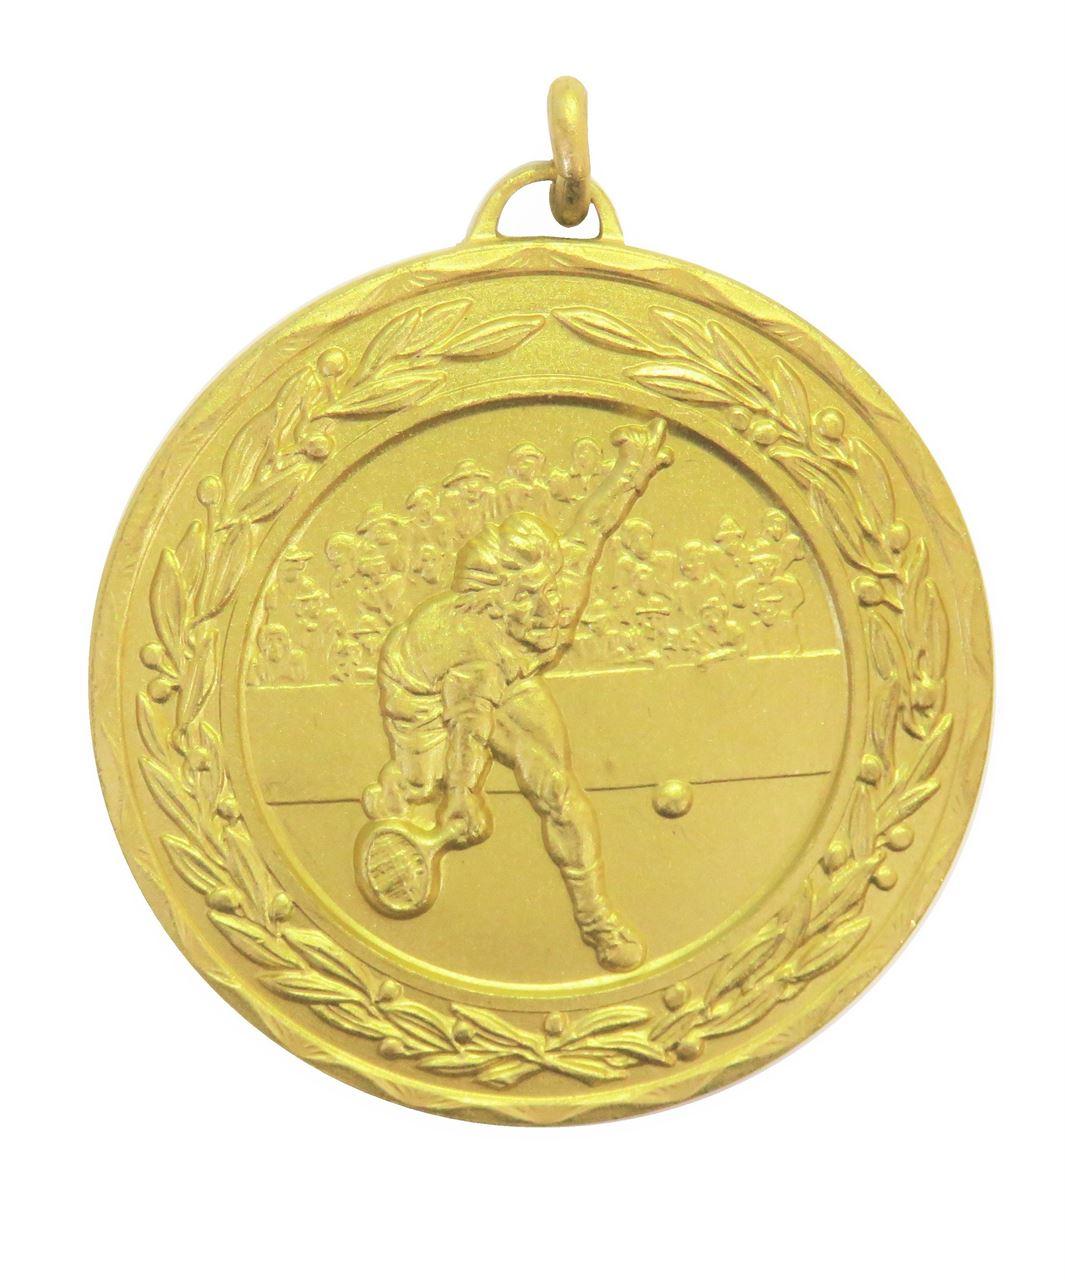 Gold Laurel Economy Men's Tennis Medal (size: 50mm) - 4180E